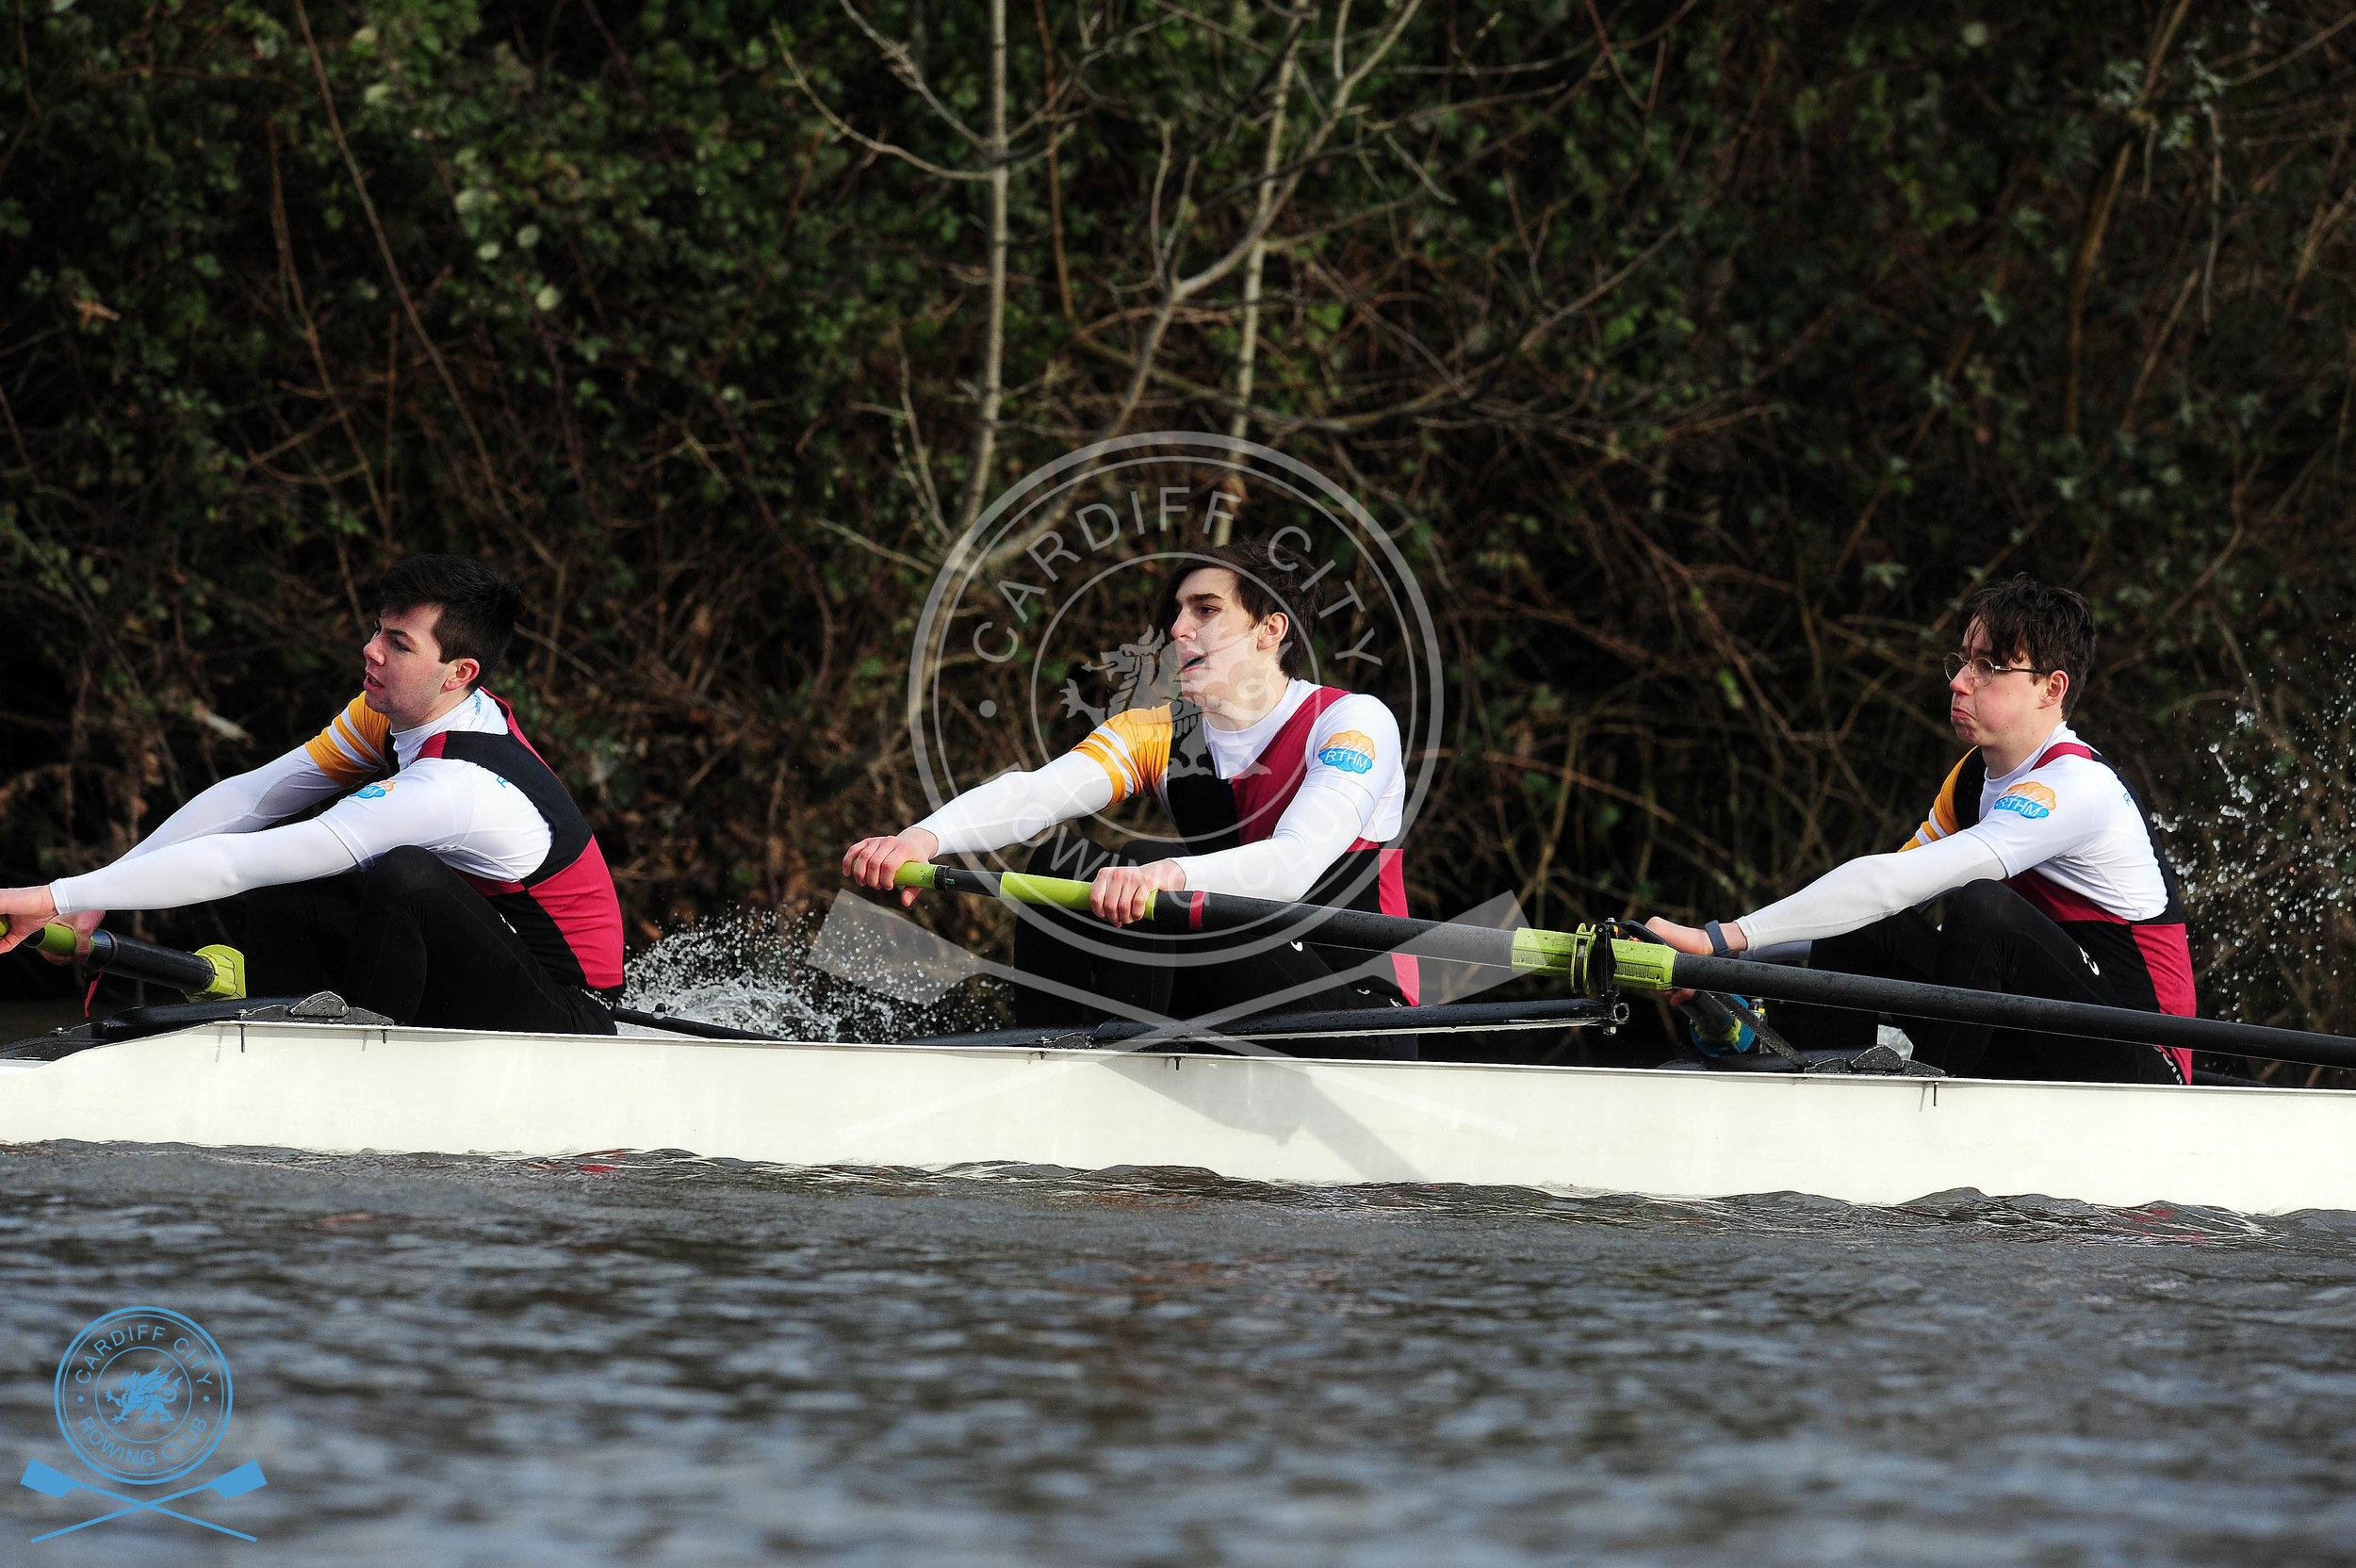 DW_280119_Cardiff_City_Rowing_275.jpg